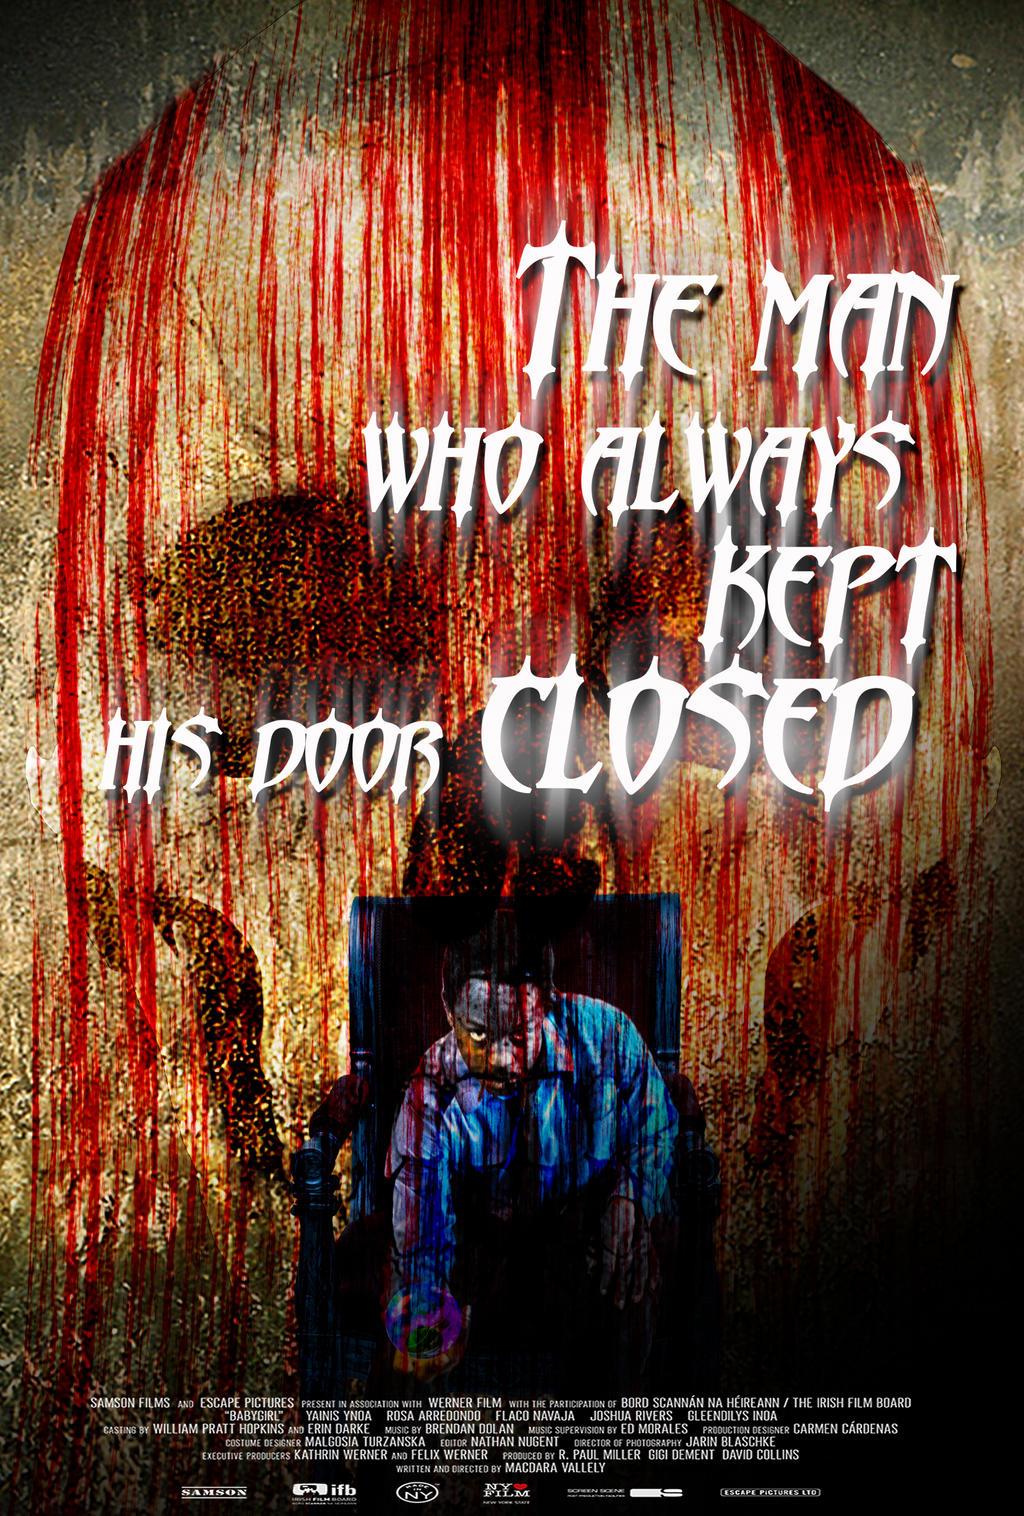 The man who always kepy has door closed